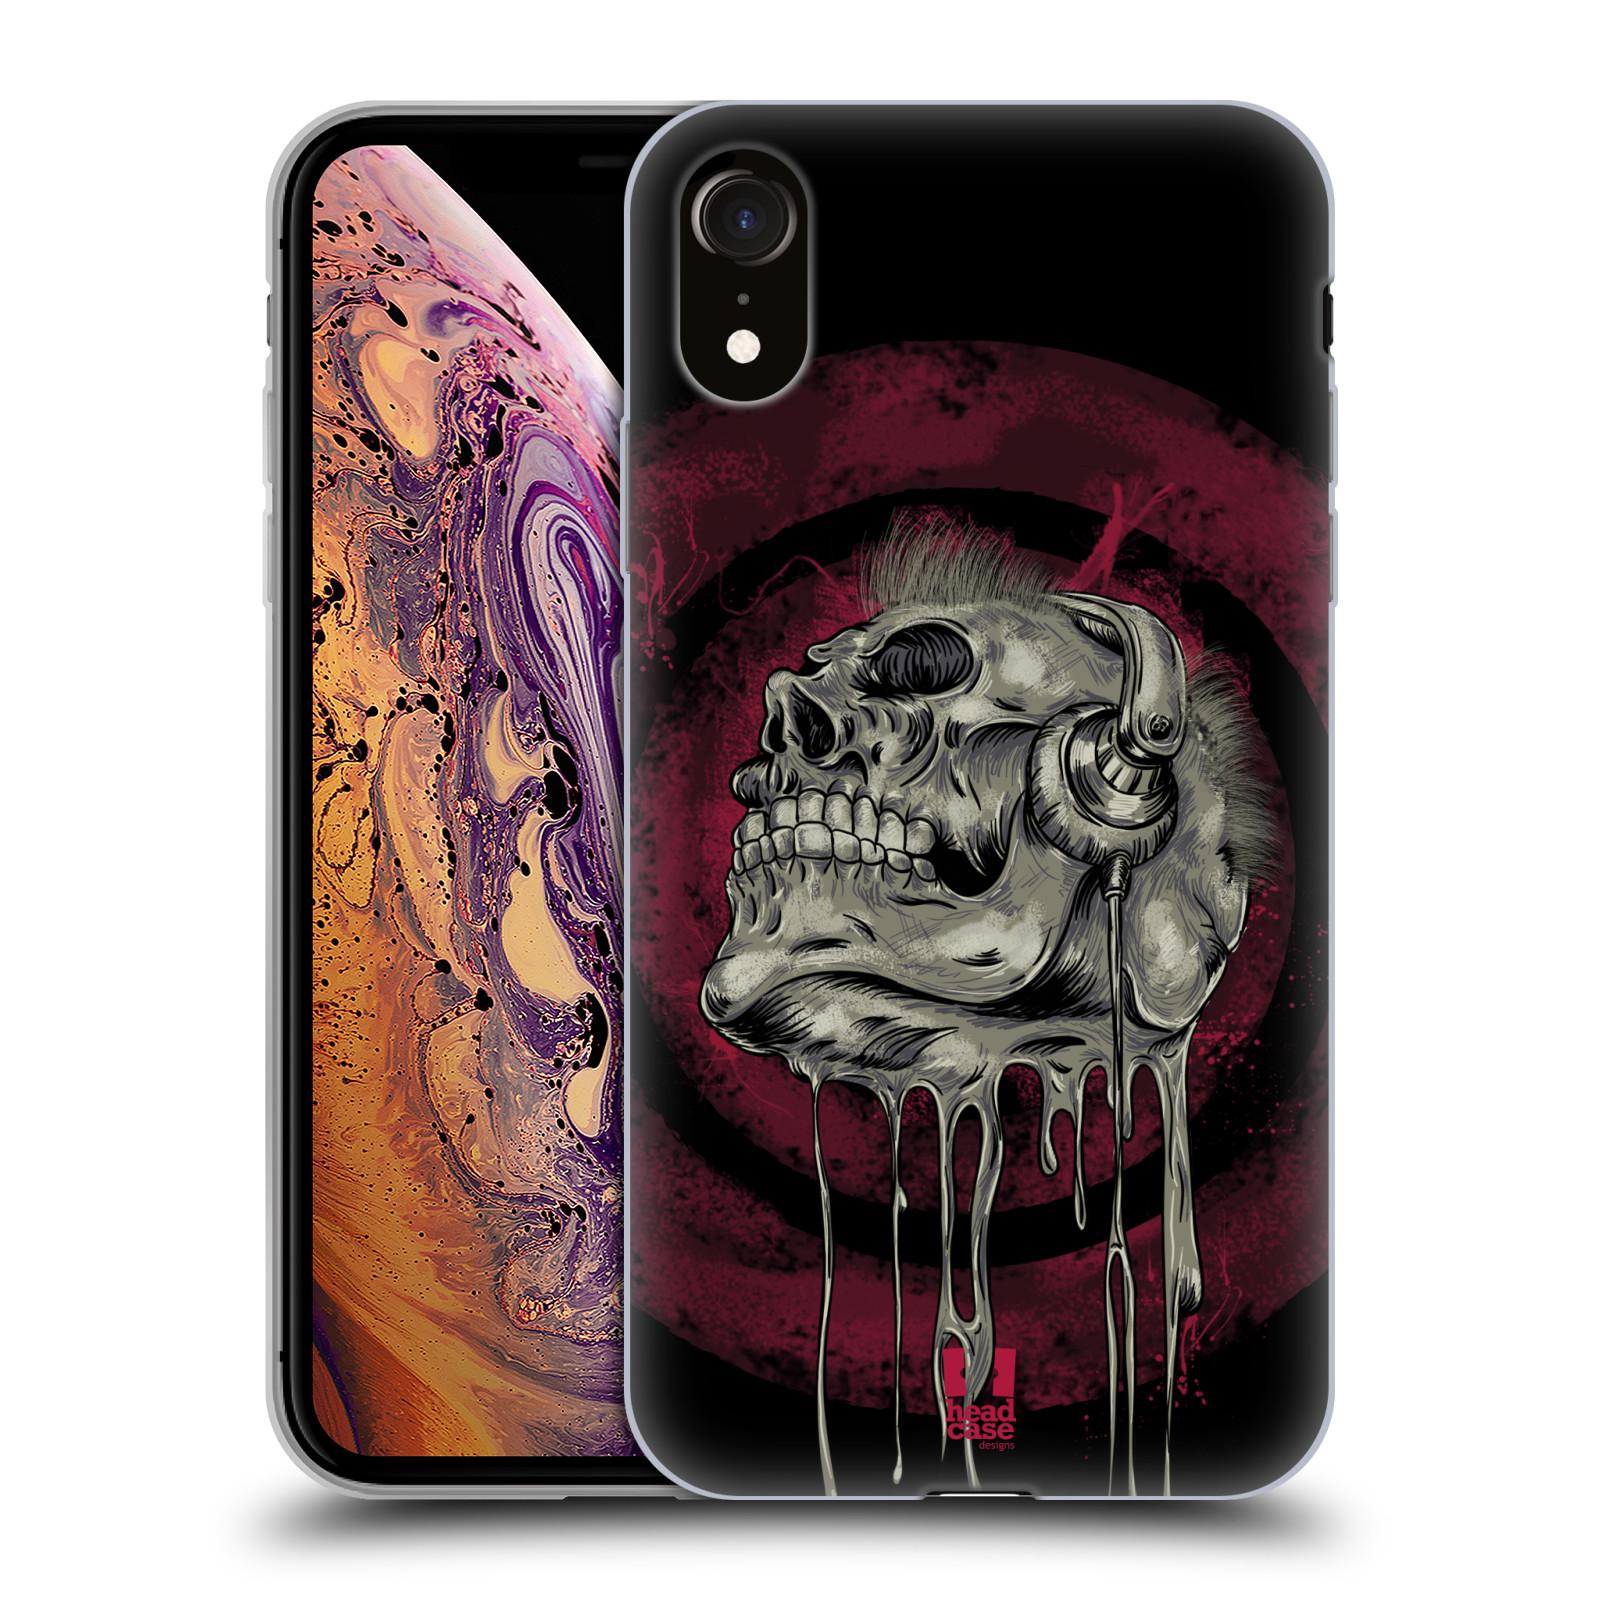 Silikonové pouzdro na mobil Apple iPhone XR - Head Case - ROCKOVÁ LEBKA